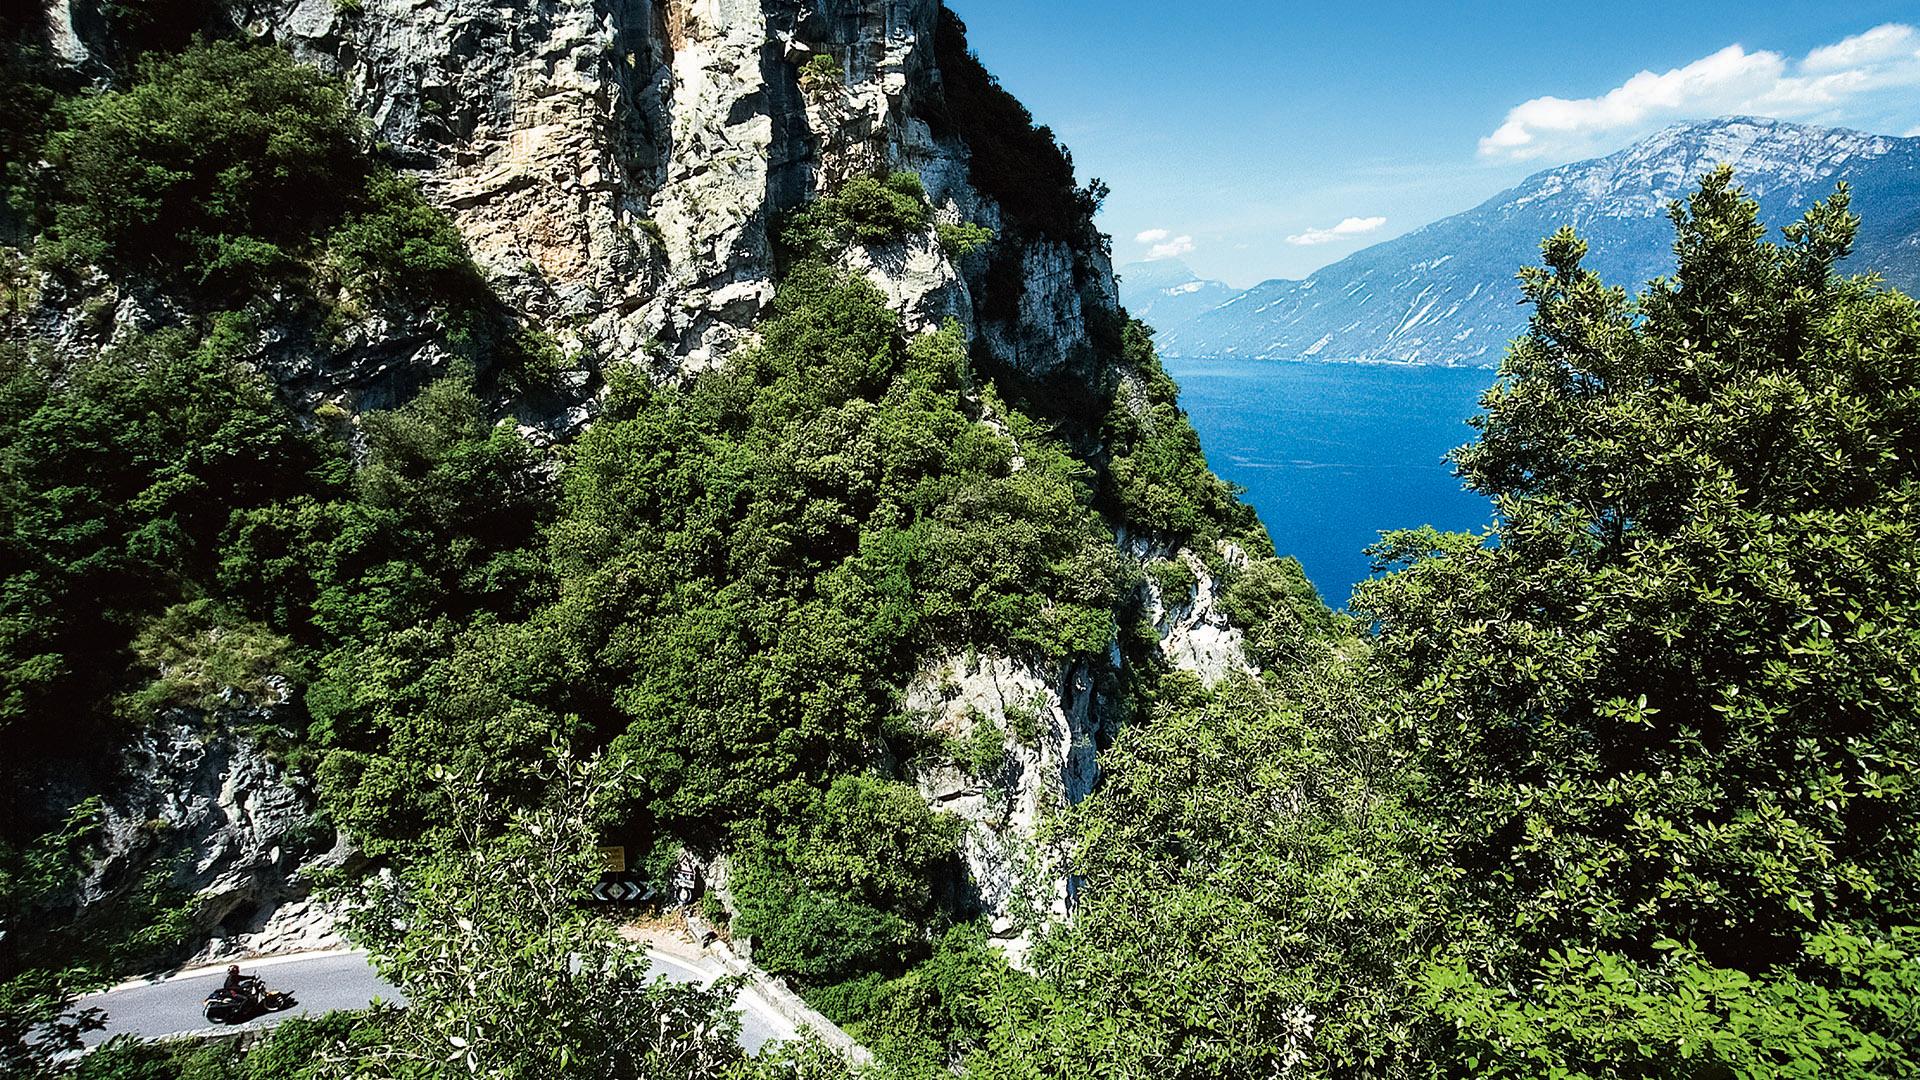 Wasserspiele - Tour 2.2: Lago d'Idro